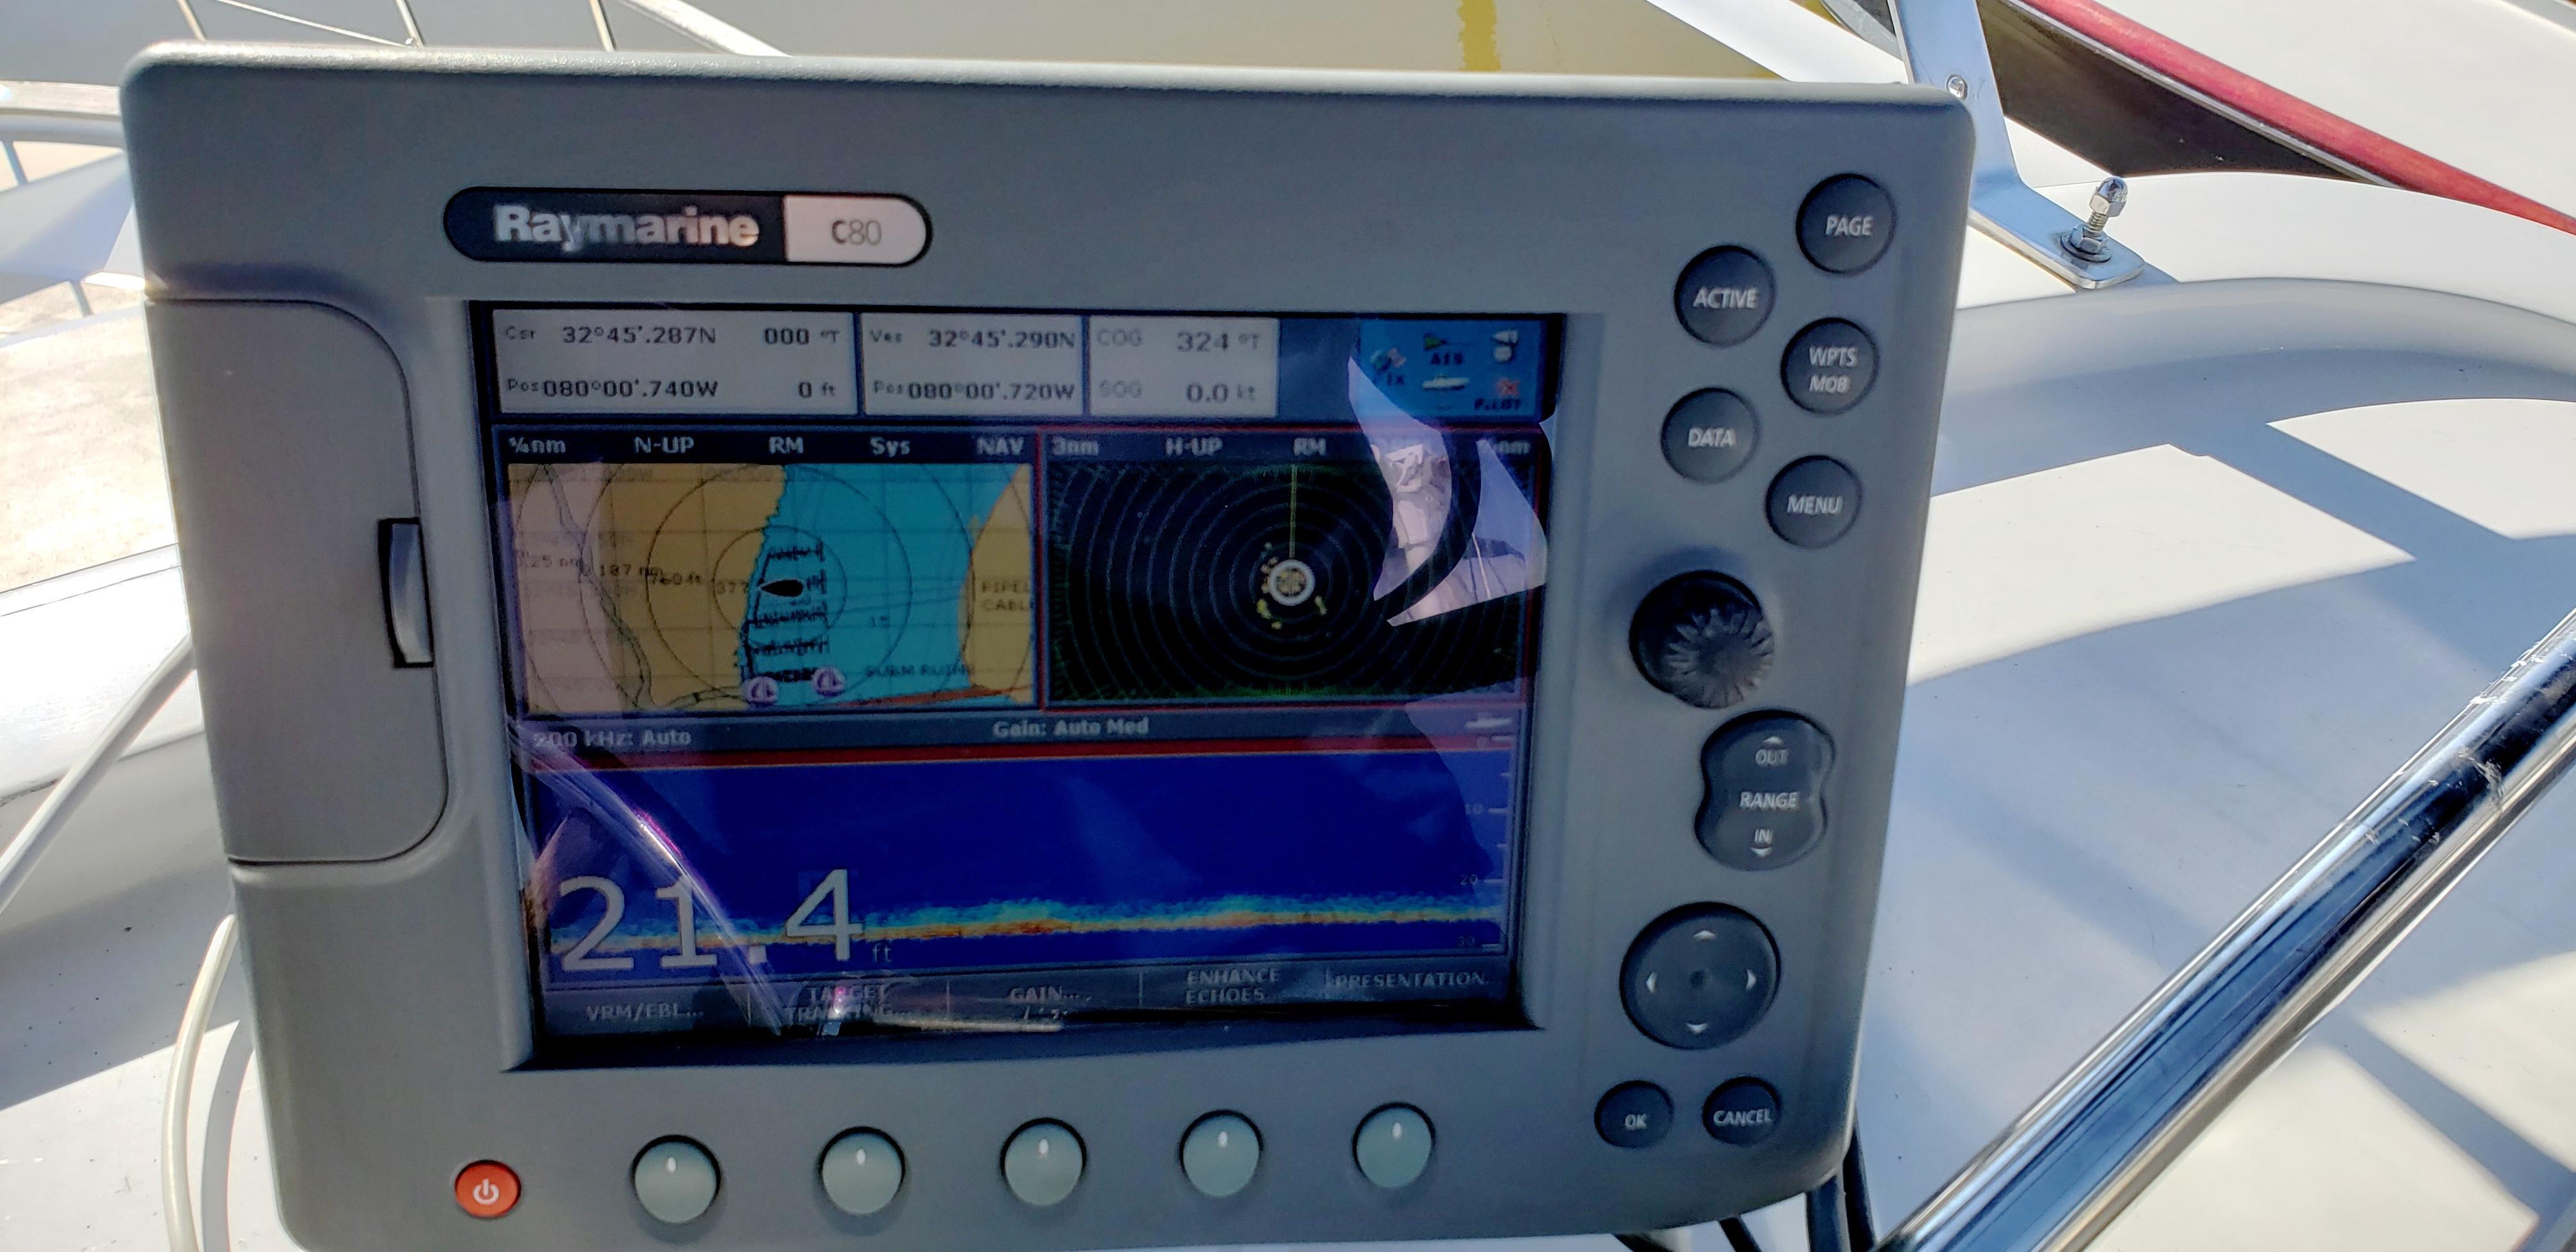 Marine Trader 43 LaBelle Trawler - Raymarine C80 plotter